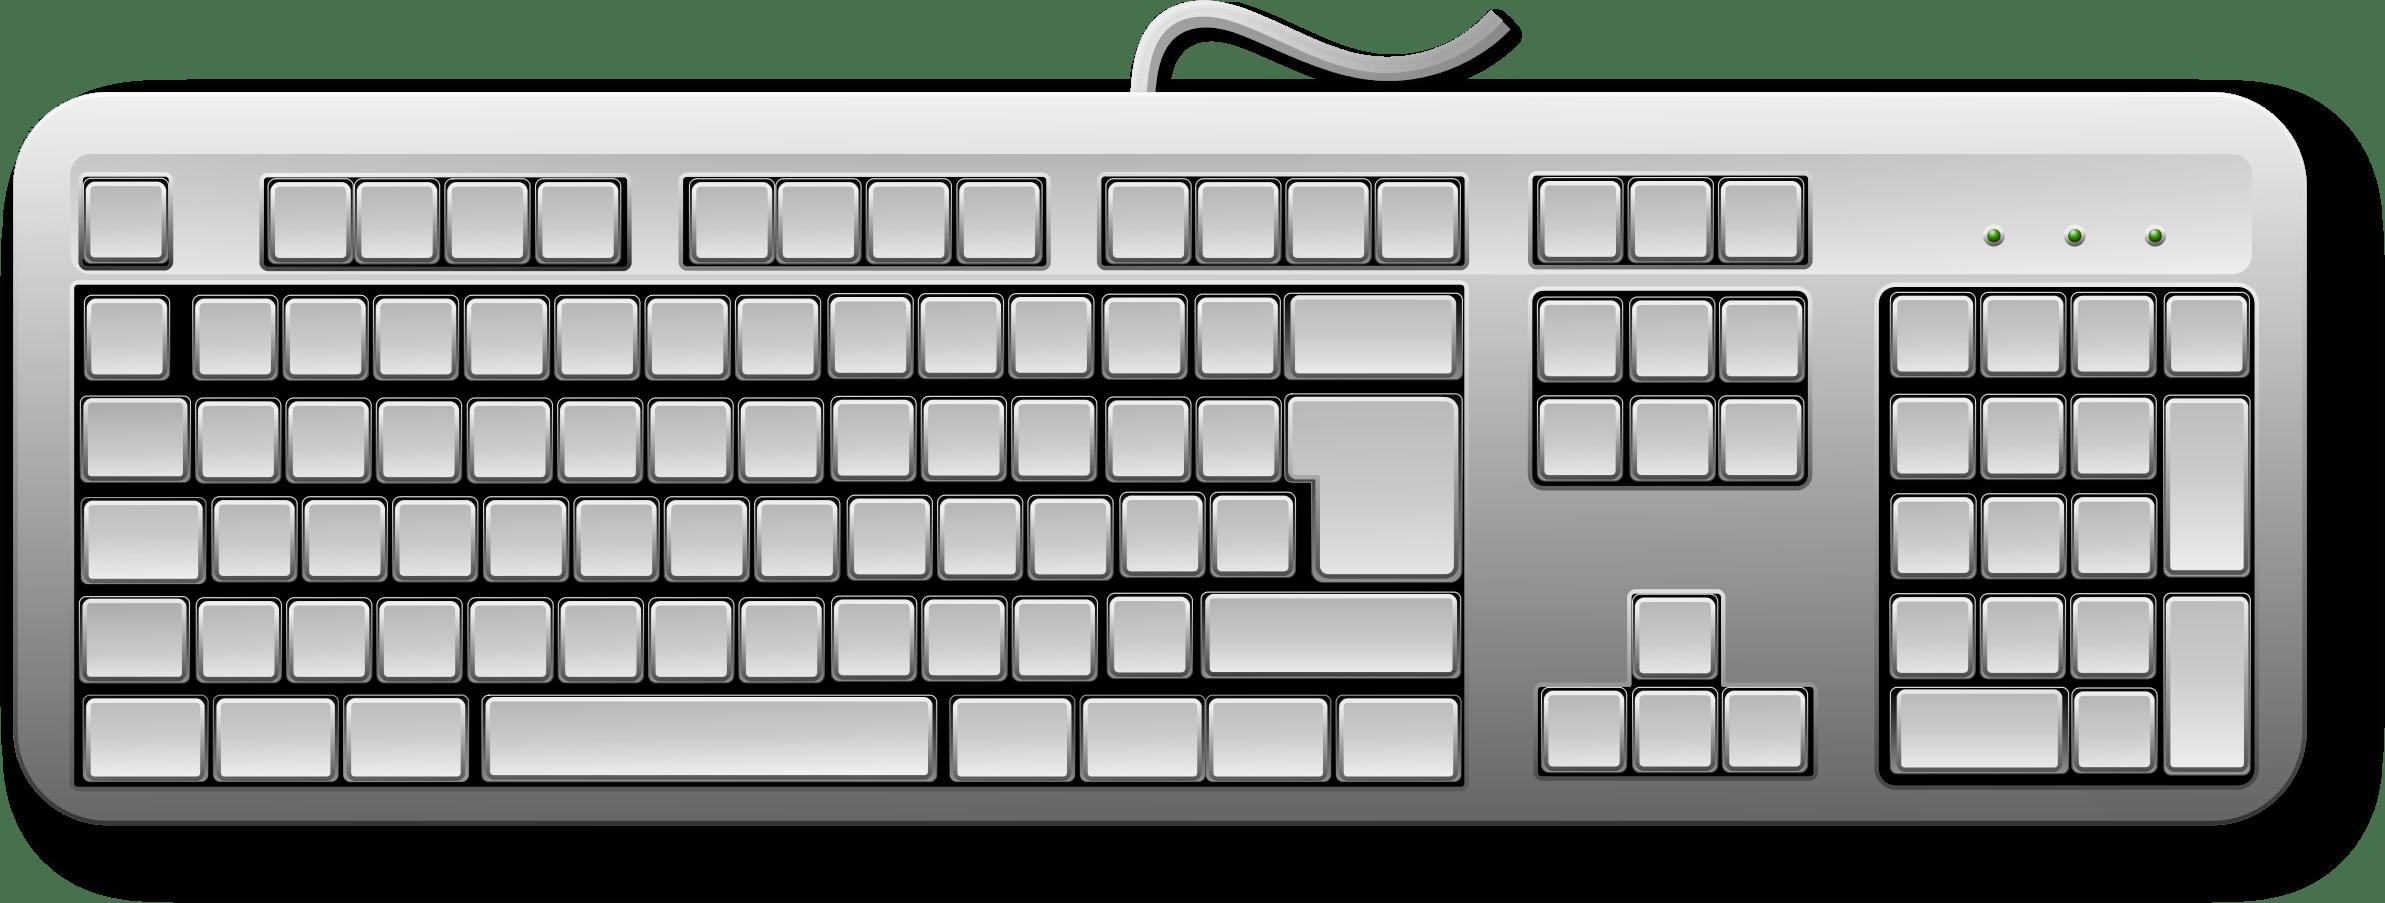 Keyboard Clipart Print Keyboard Print Transparent Free